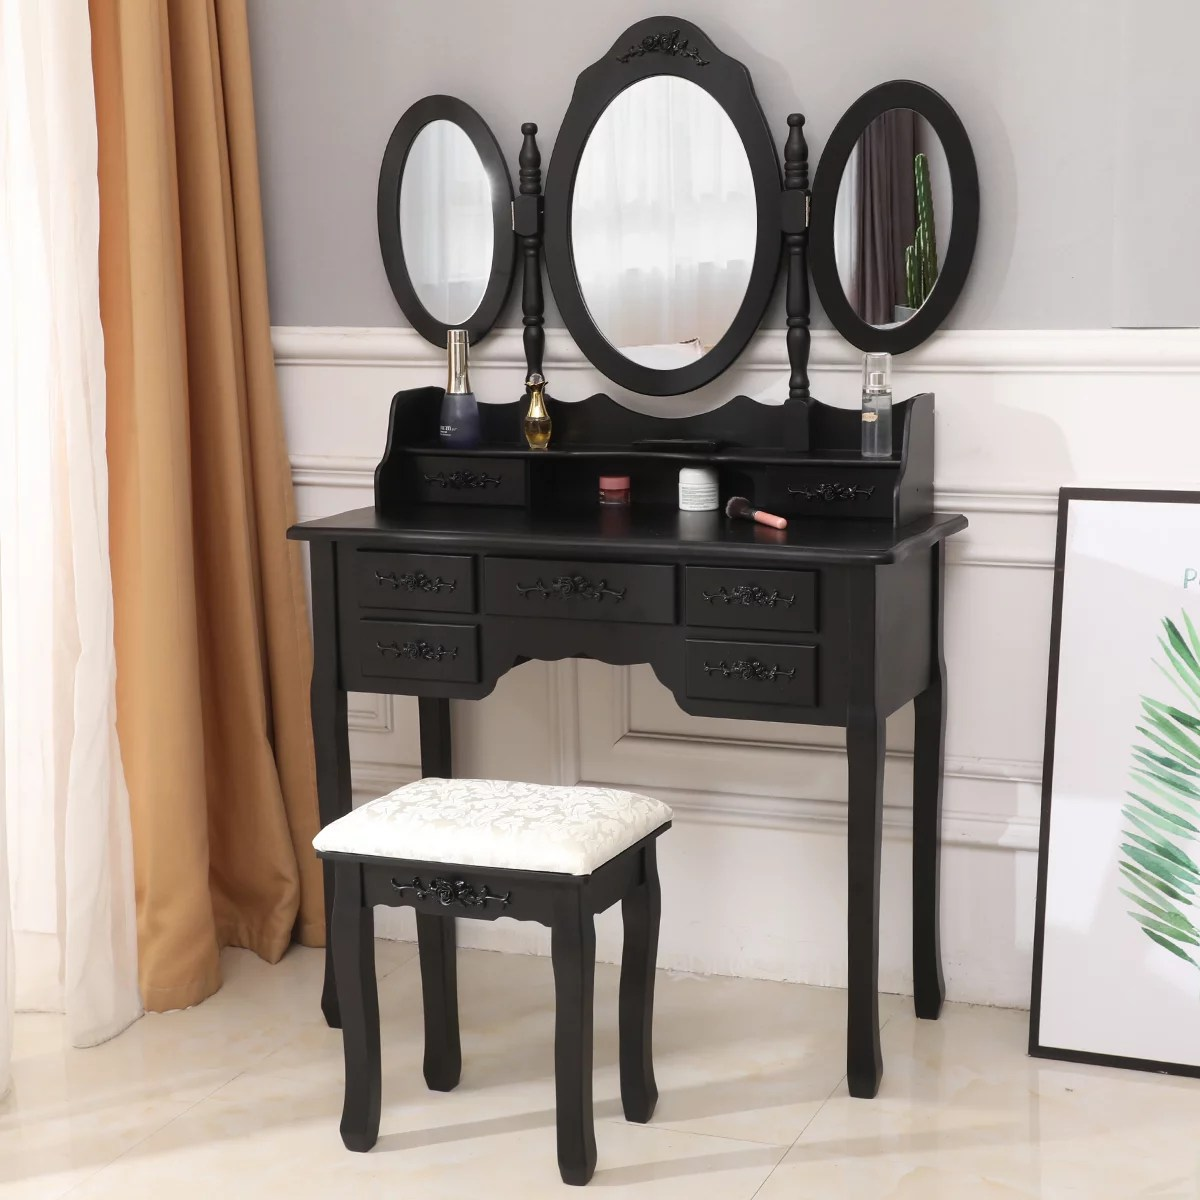 zimtown tri folding set makeup table mirror vanity dresser dressing desk 7 drawers bedroom wood black